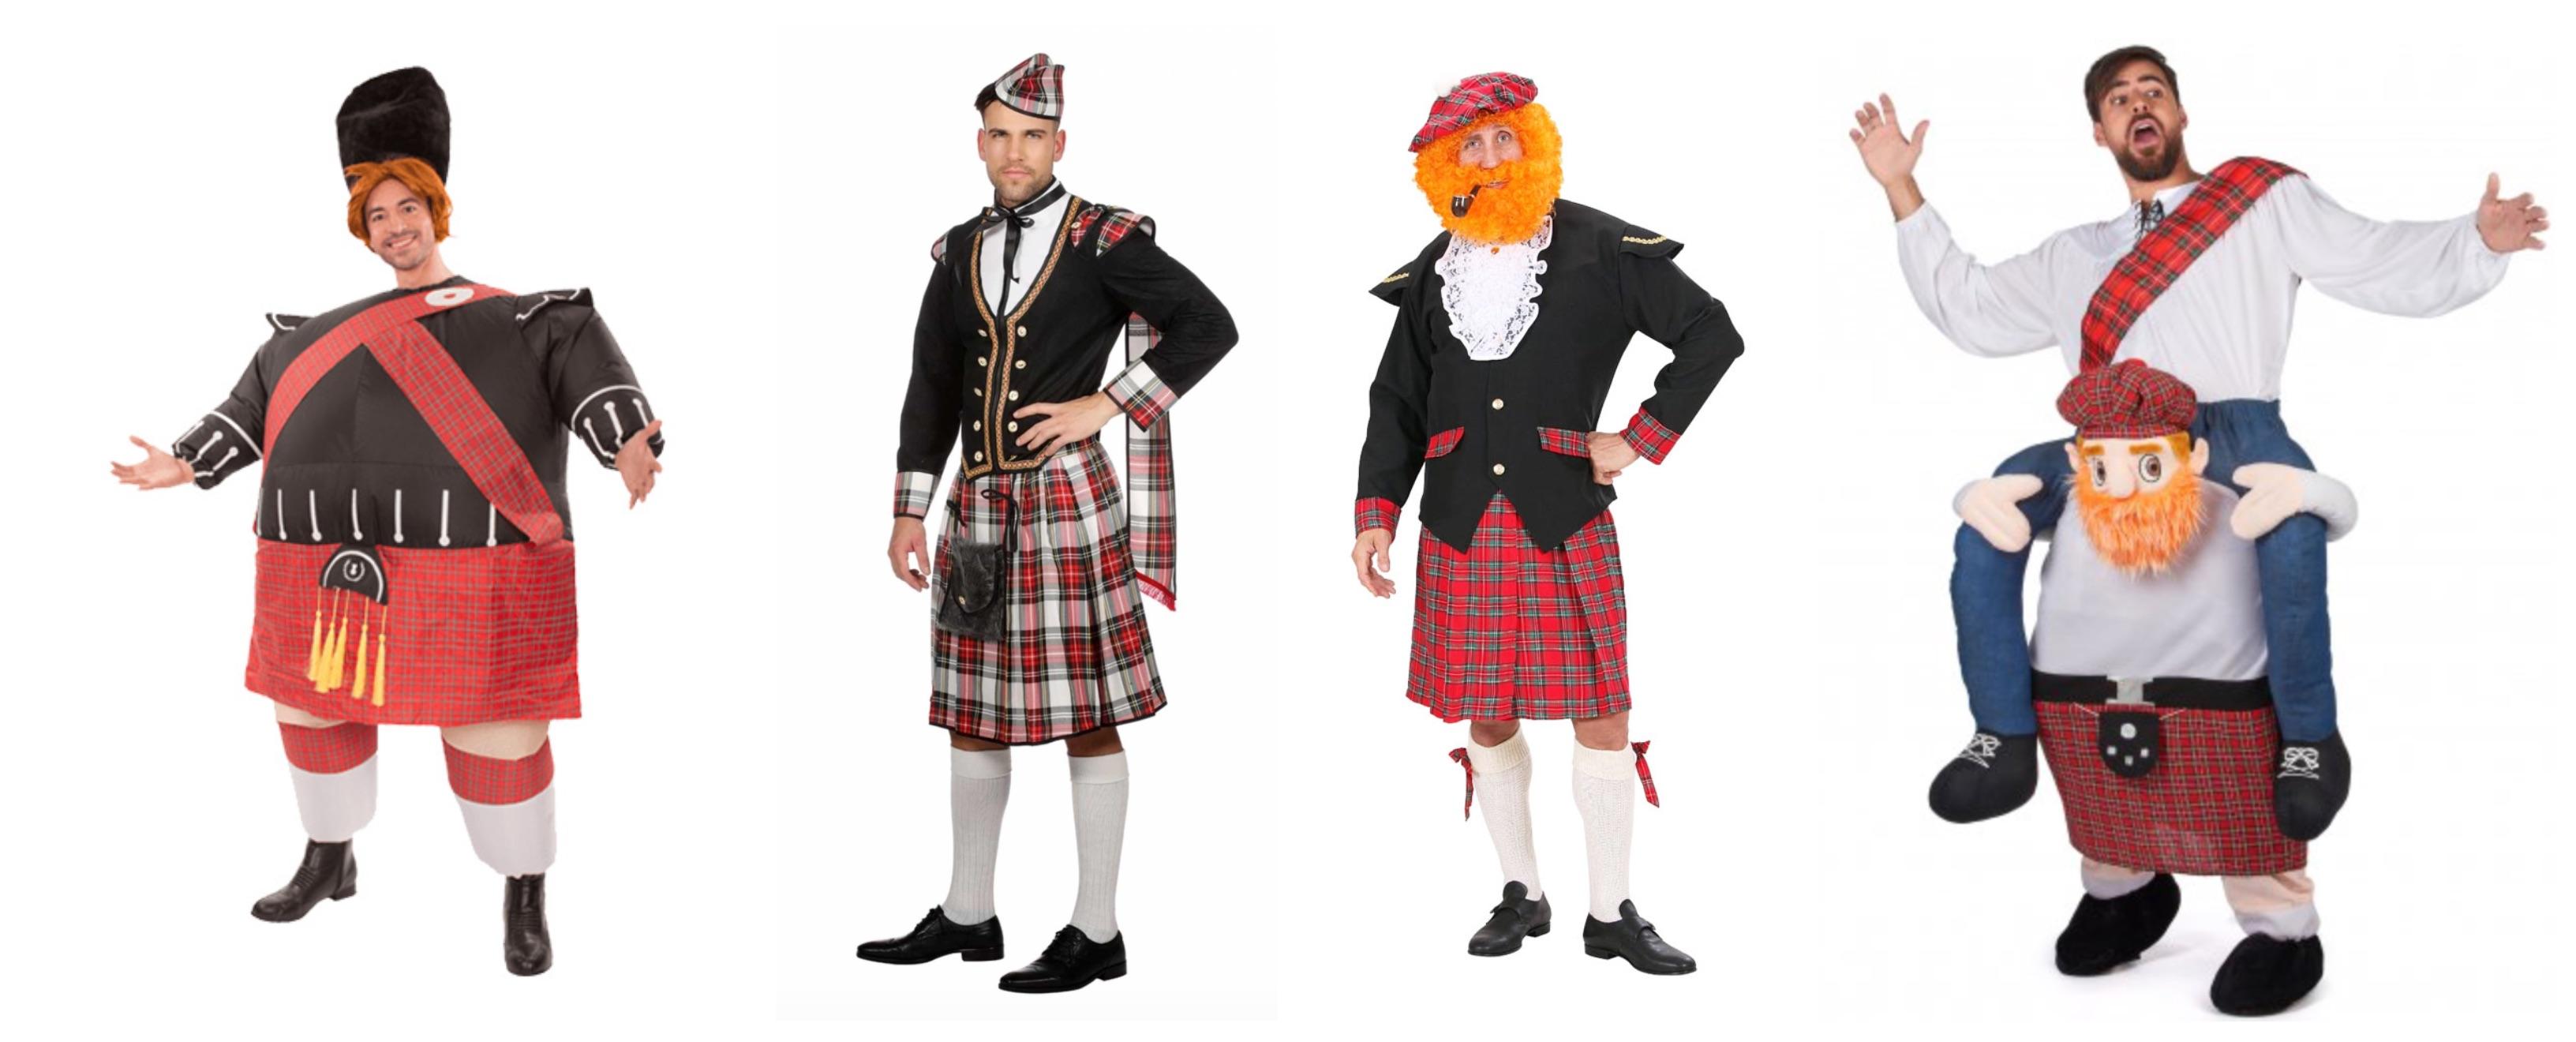 skotte kostume til voksne - Skotte kostume til voksne